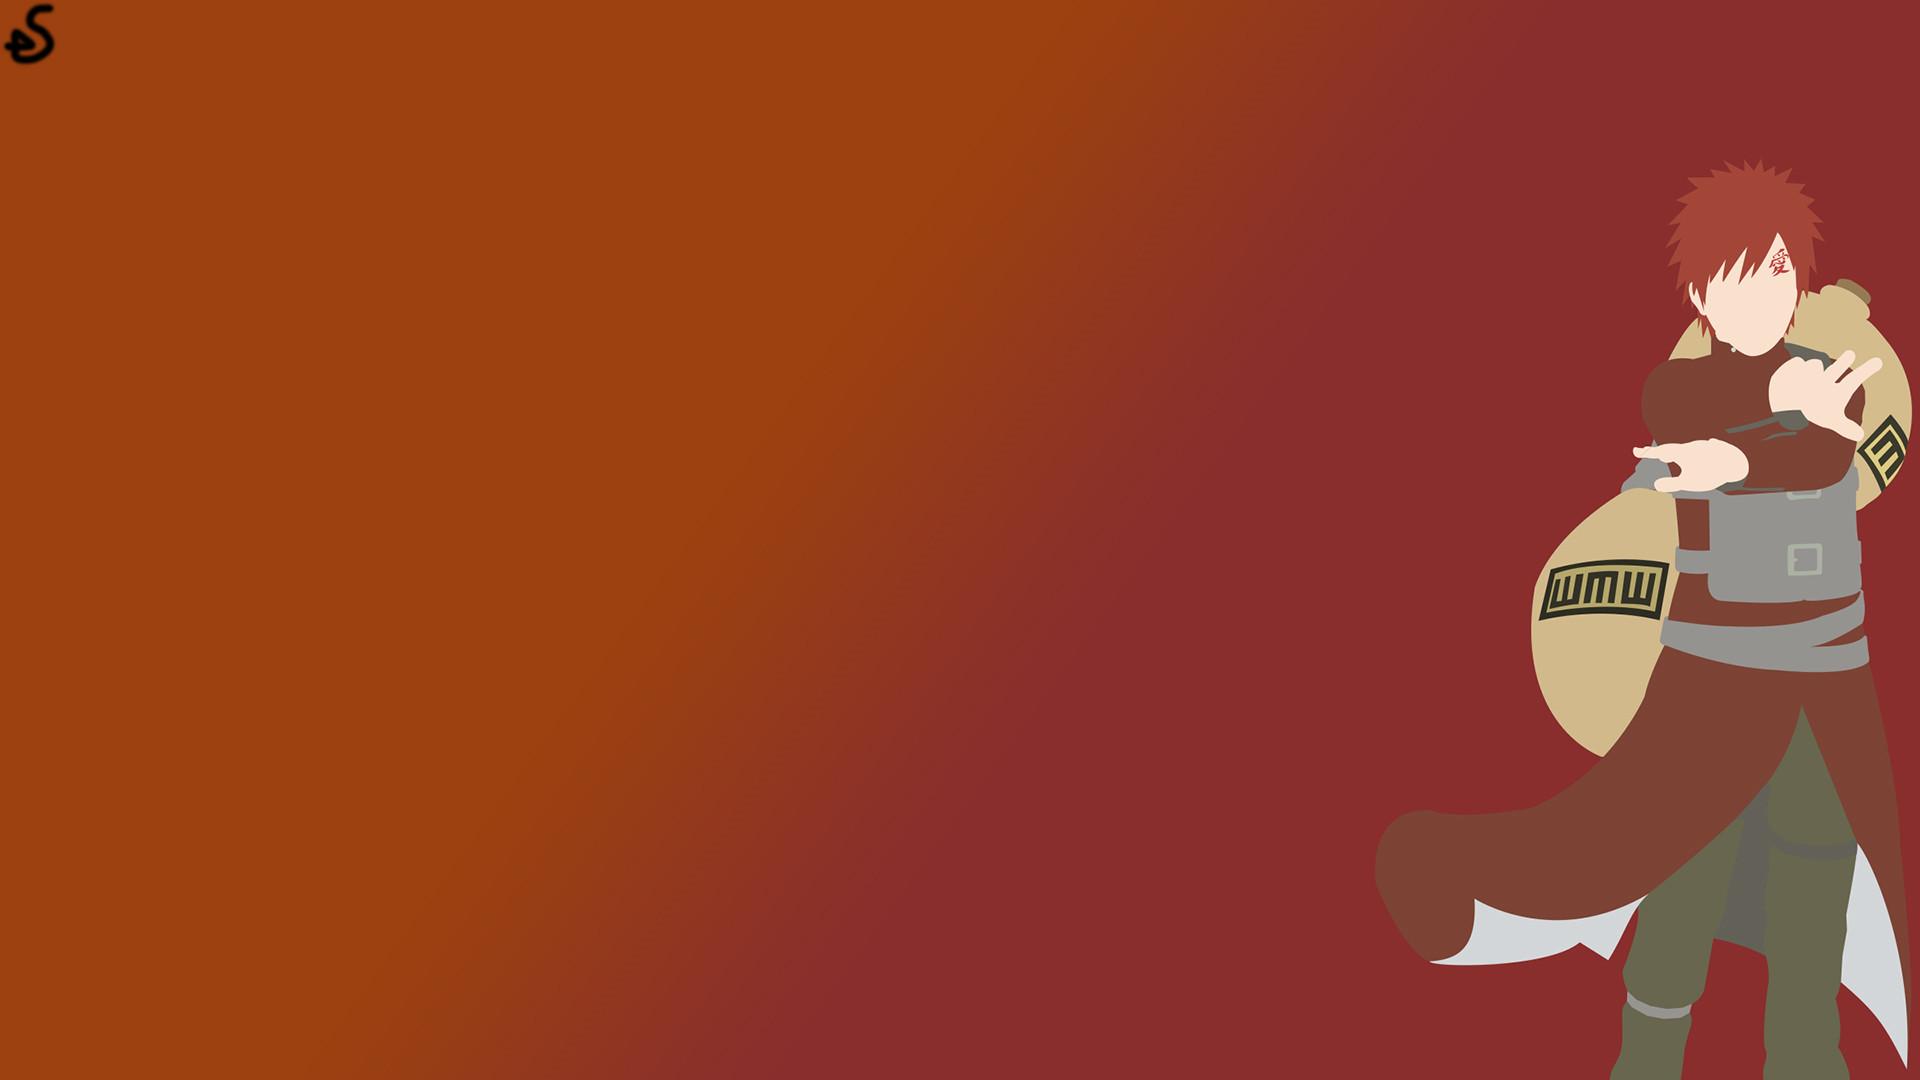 … Gaara of the Desert (Naruto) Desktop wallpaper by ShogunArts98